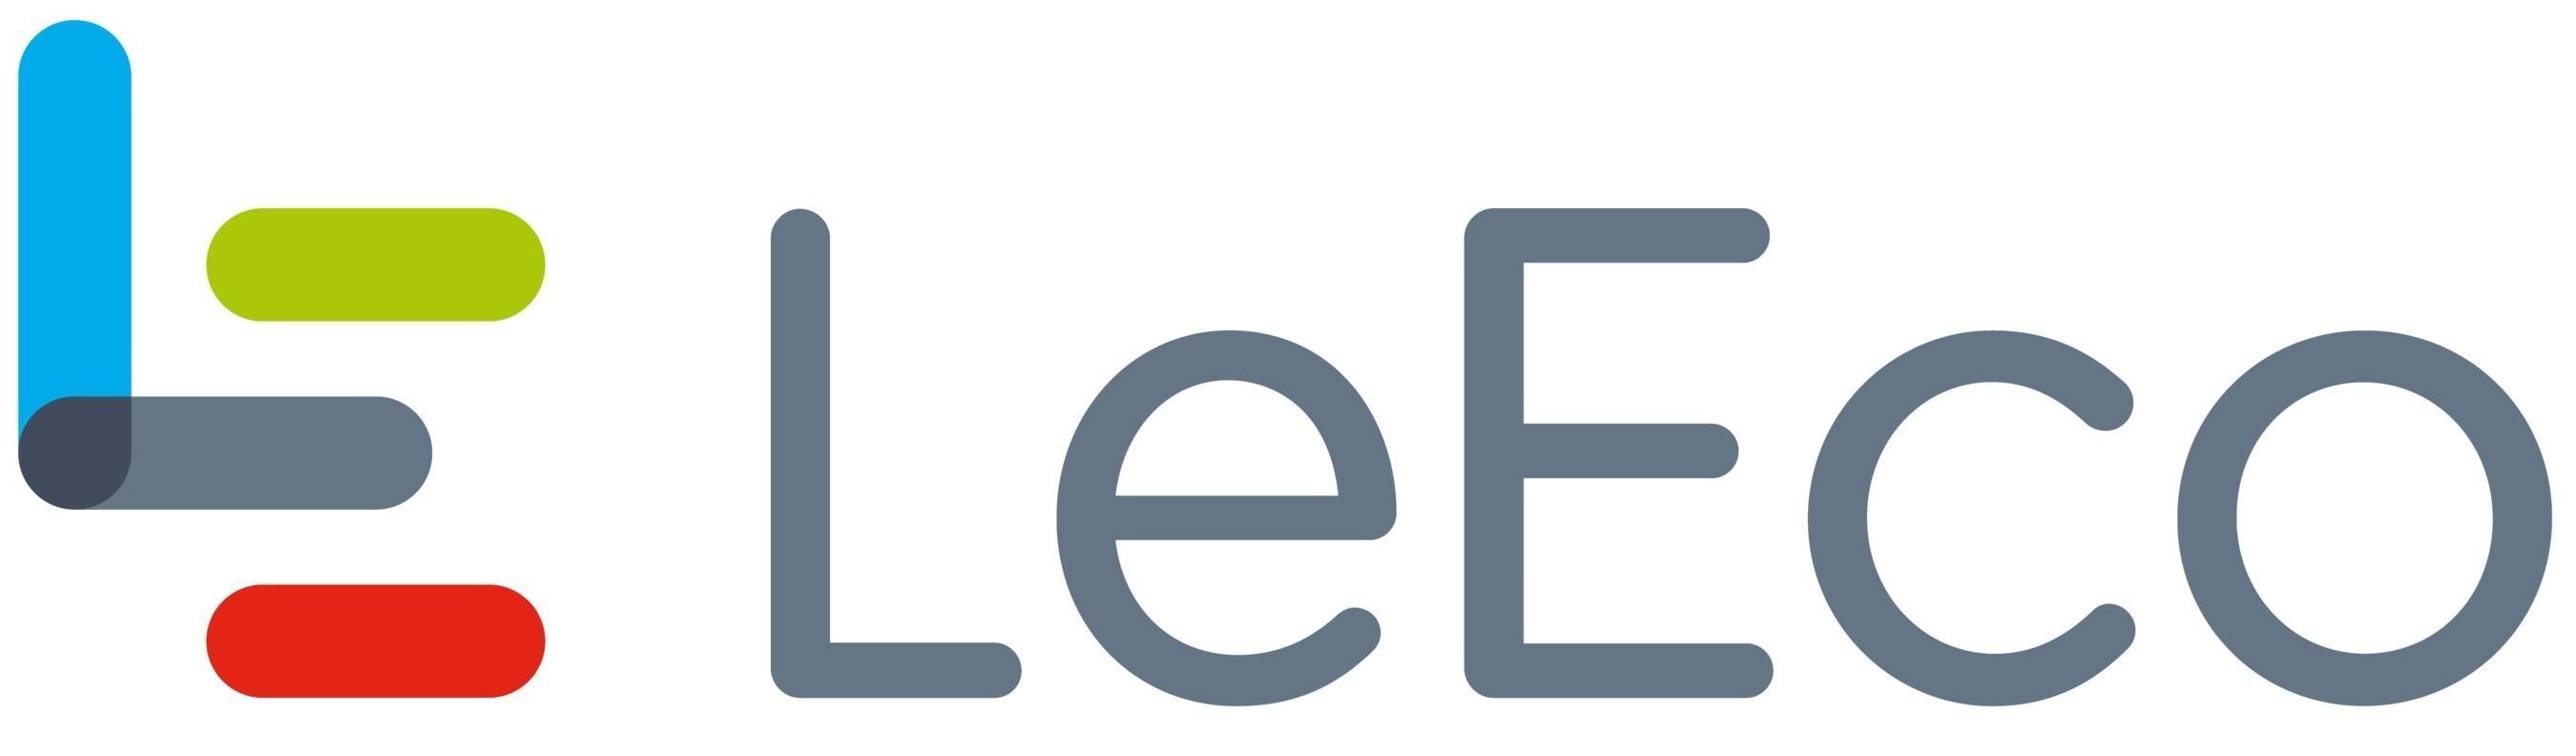 LeEco company logo